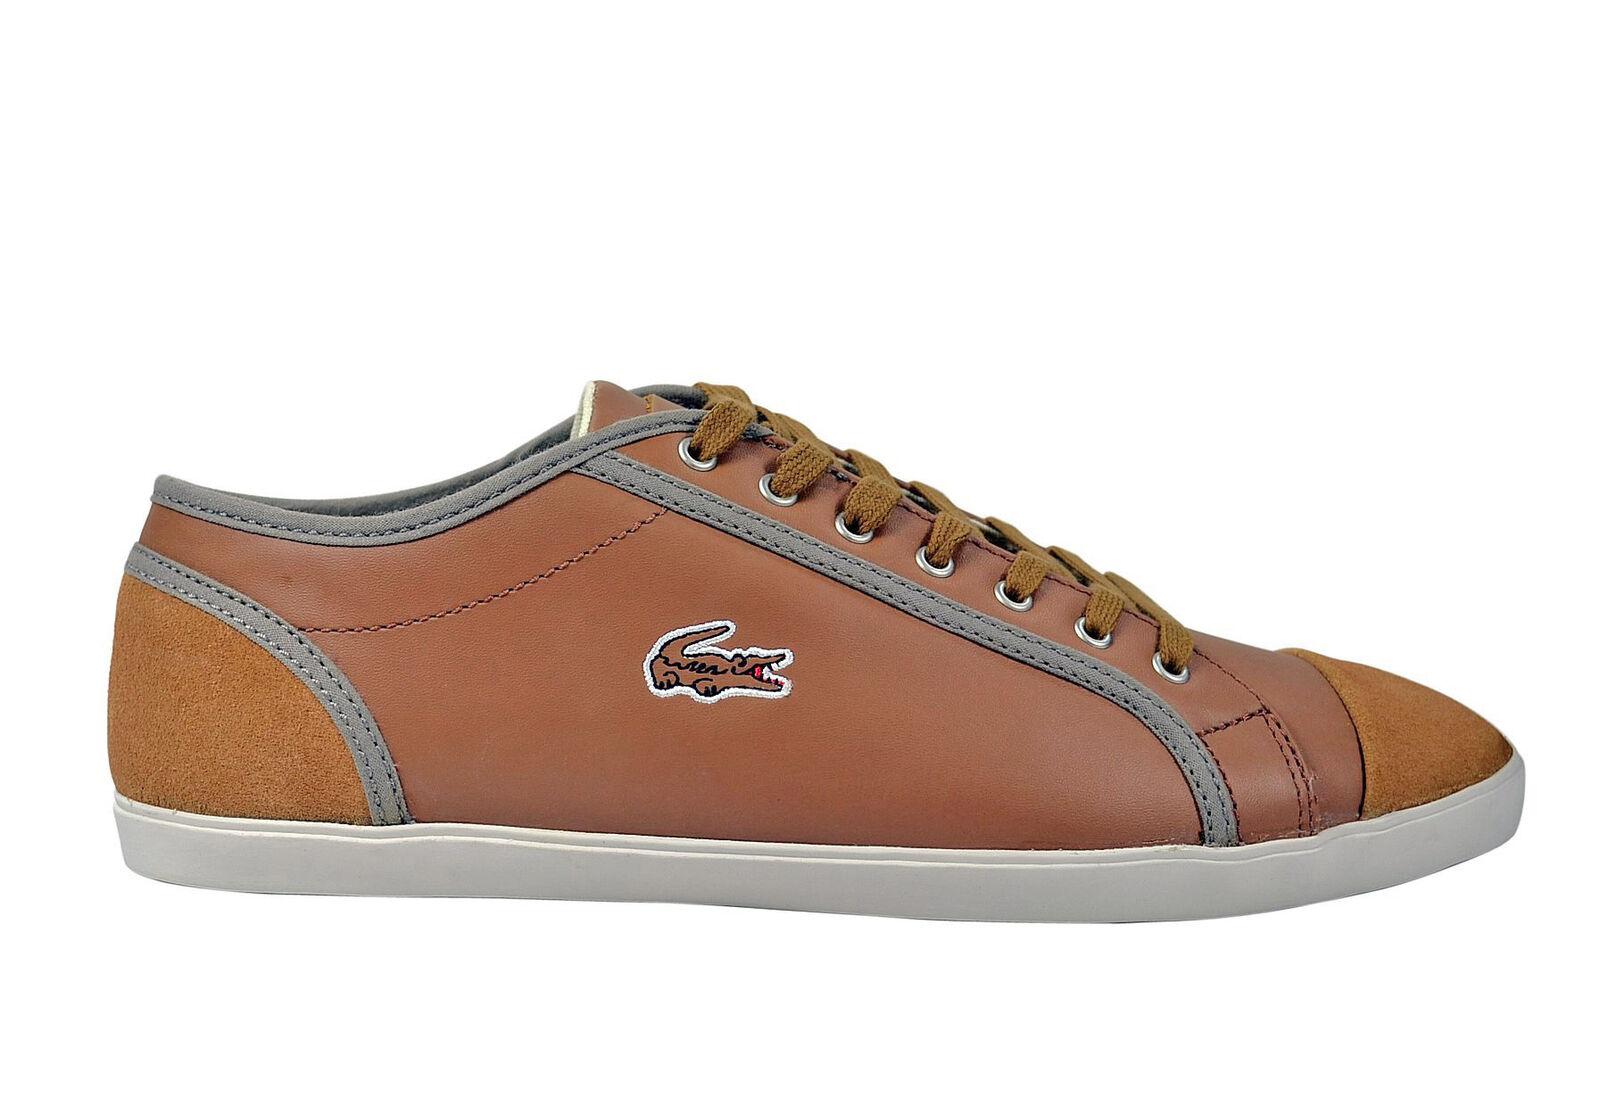 Lacoste Lacoste Lacoste Berber 8 SRM tan LTH beige/braun Zapatos/Sneaker 50e04f